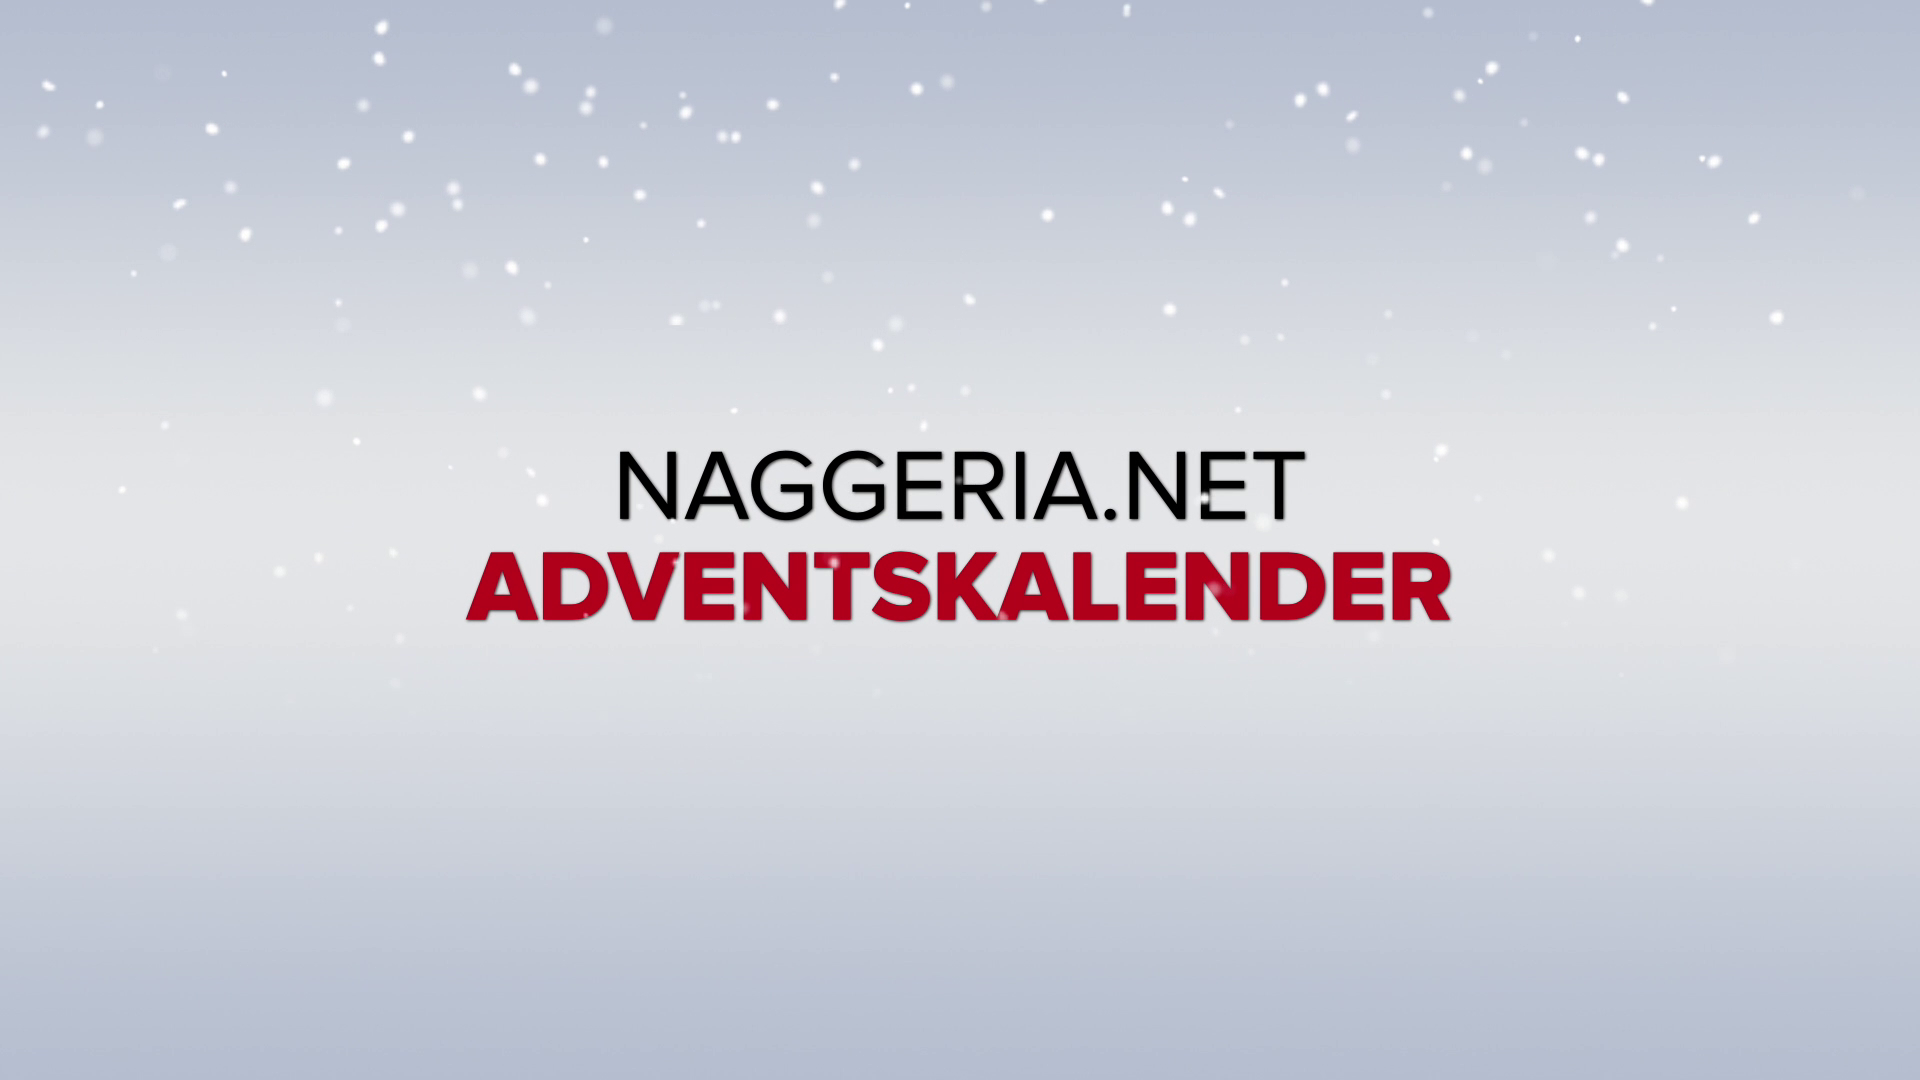 Naggeria Adventskalender 2015